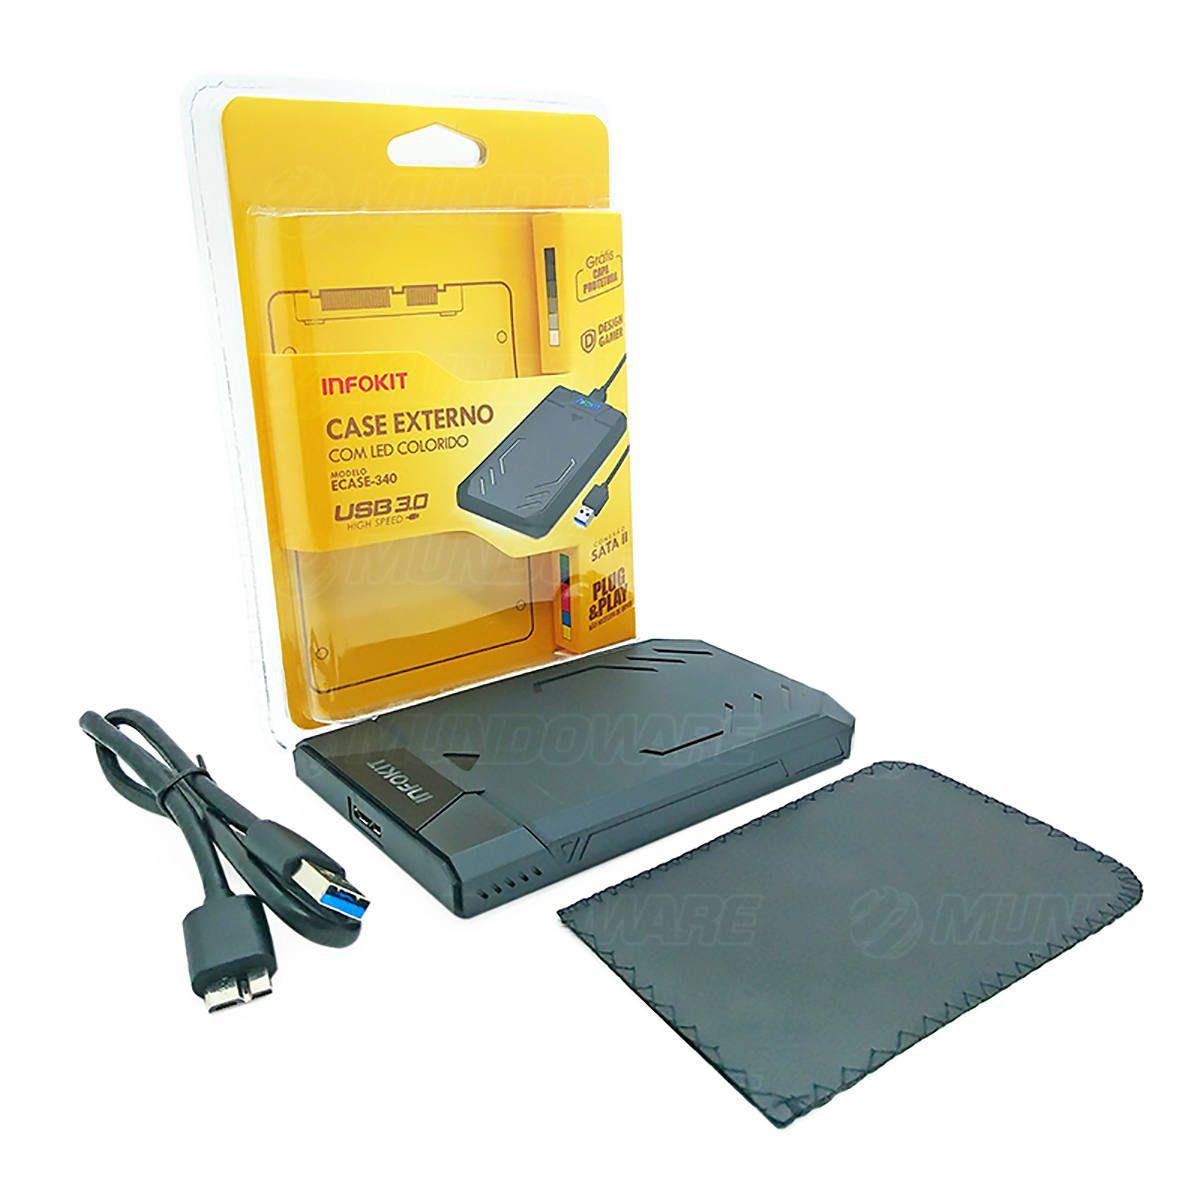 "Case Externo USB 3.0 Fast 5Gbps apoio UASP para HD SSD SATA II 2.5"" 3TB LED Colorido e Capa Protetora Infokit Ecase-340"